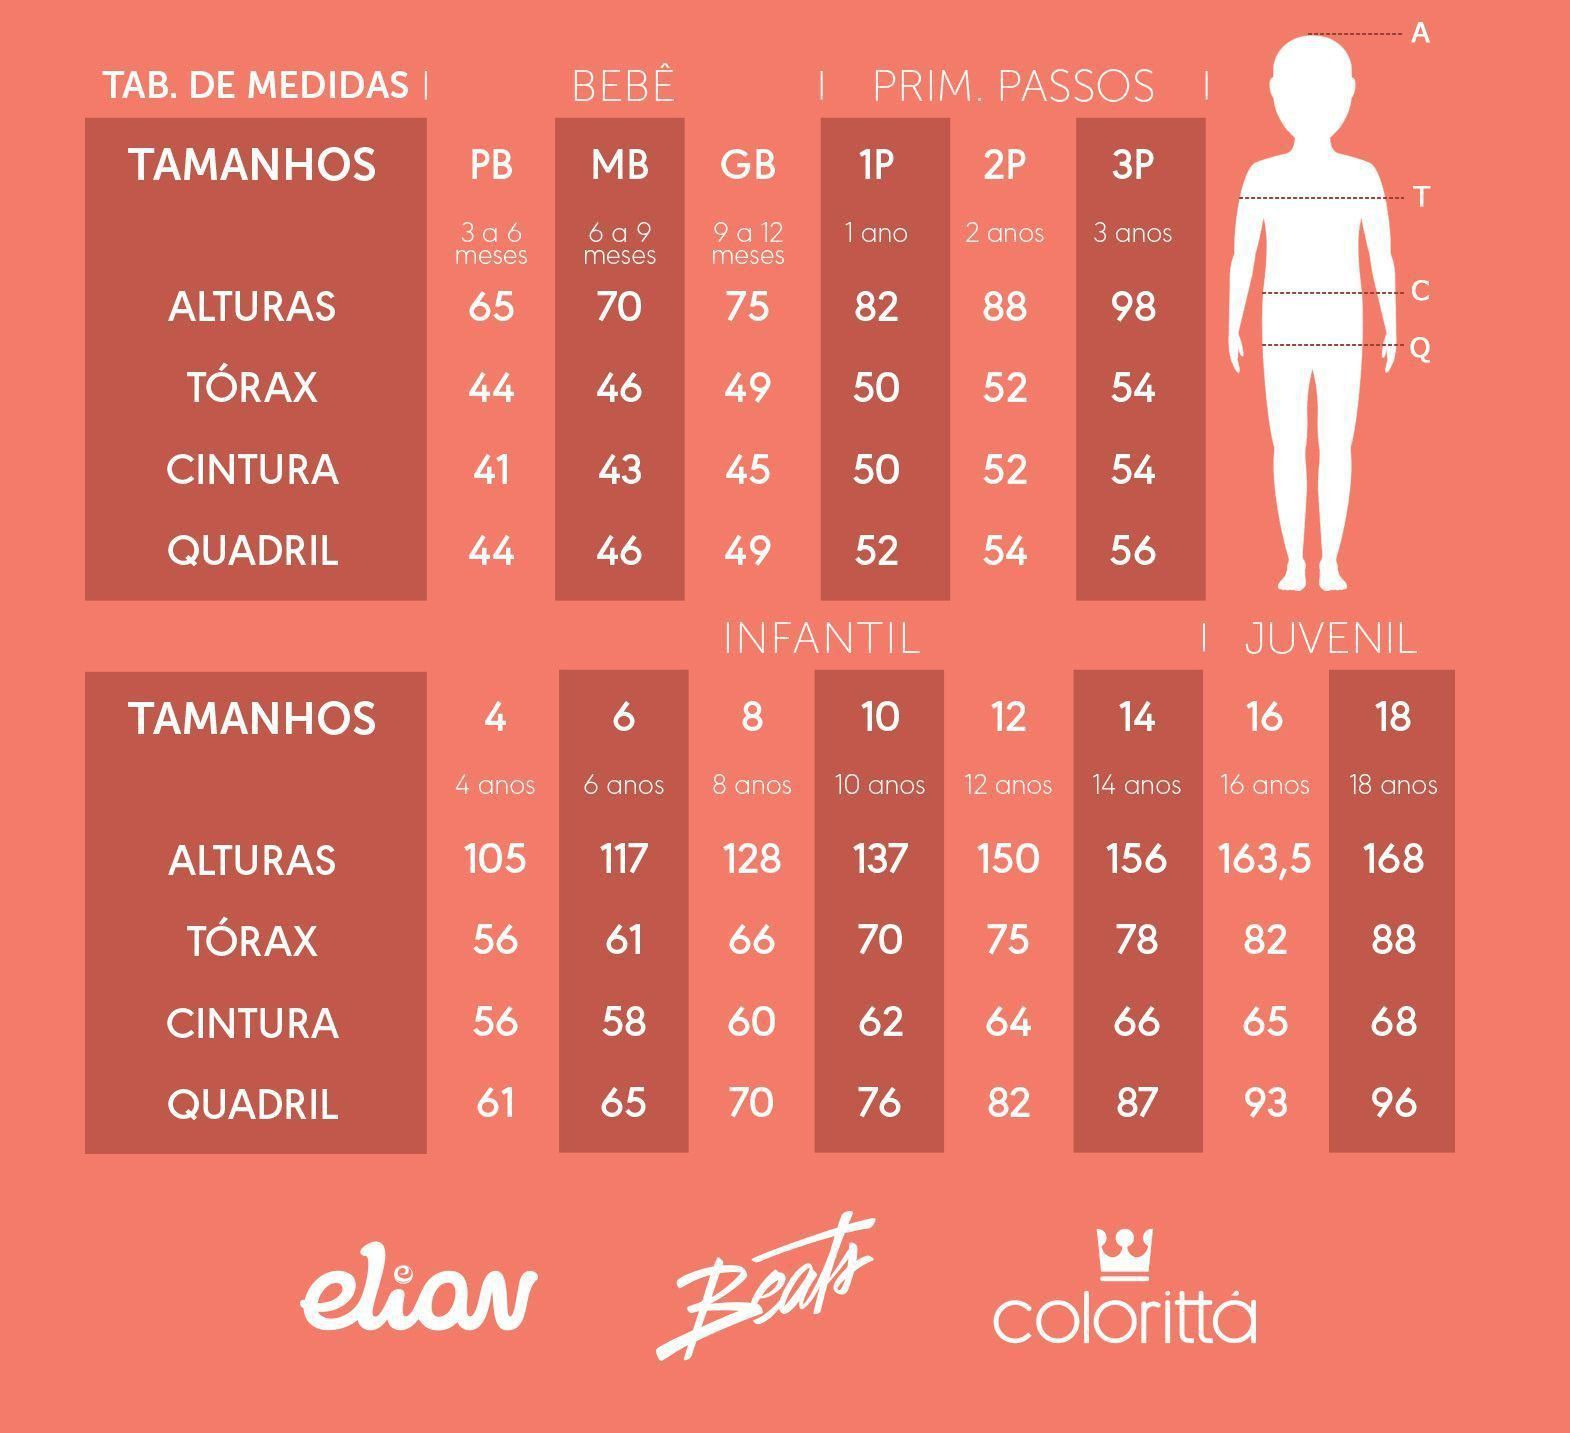 Conjunto Infantil Masculino Preto Downtown - Elian: Tabela de medidas